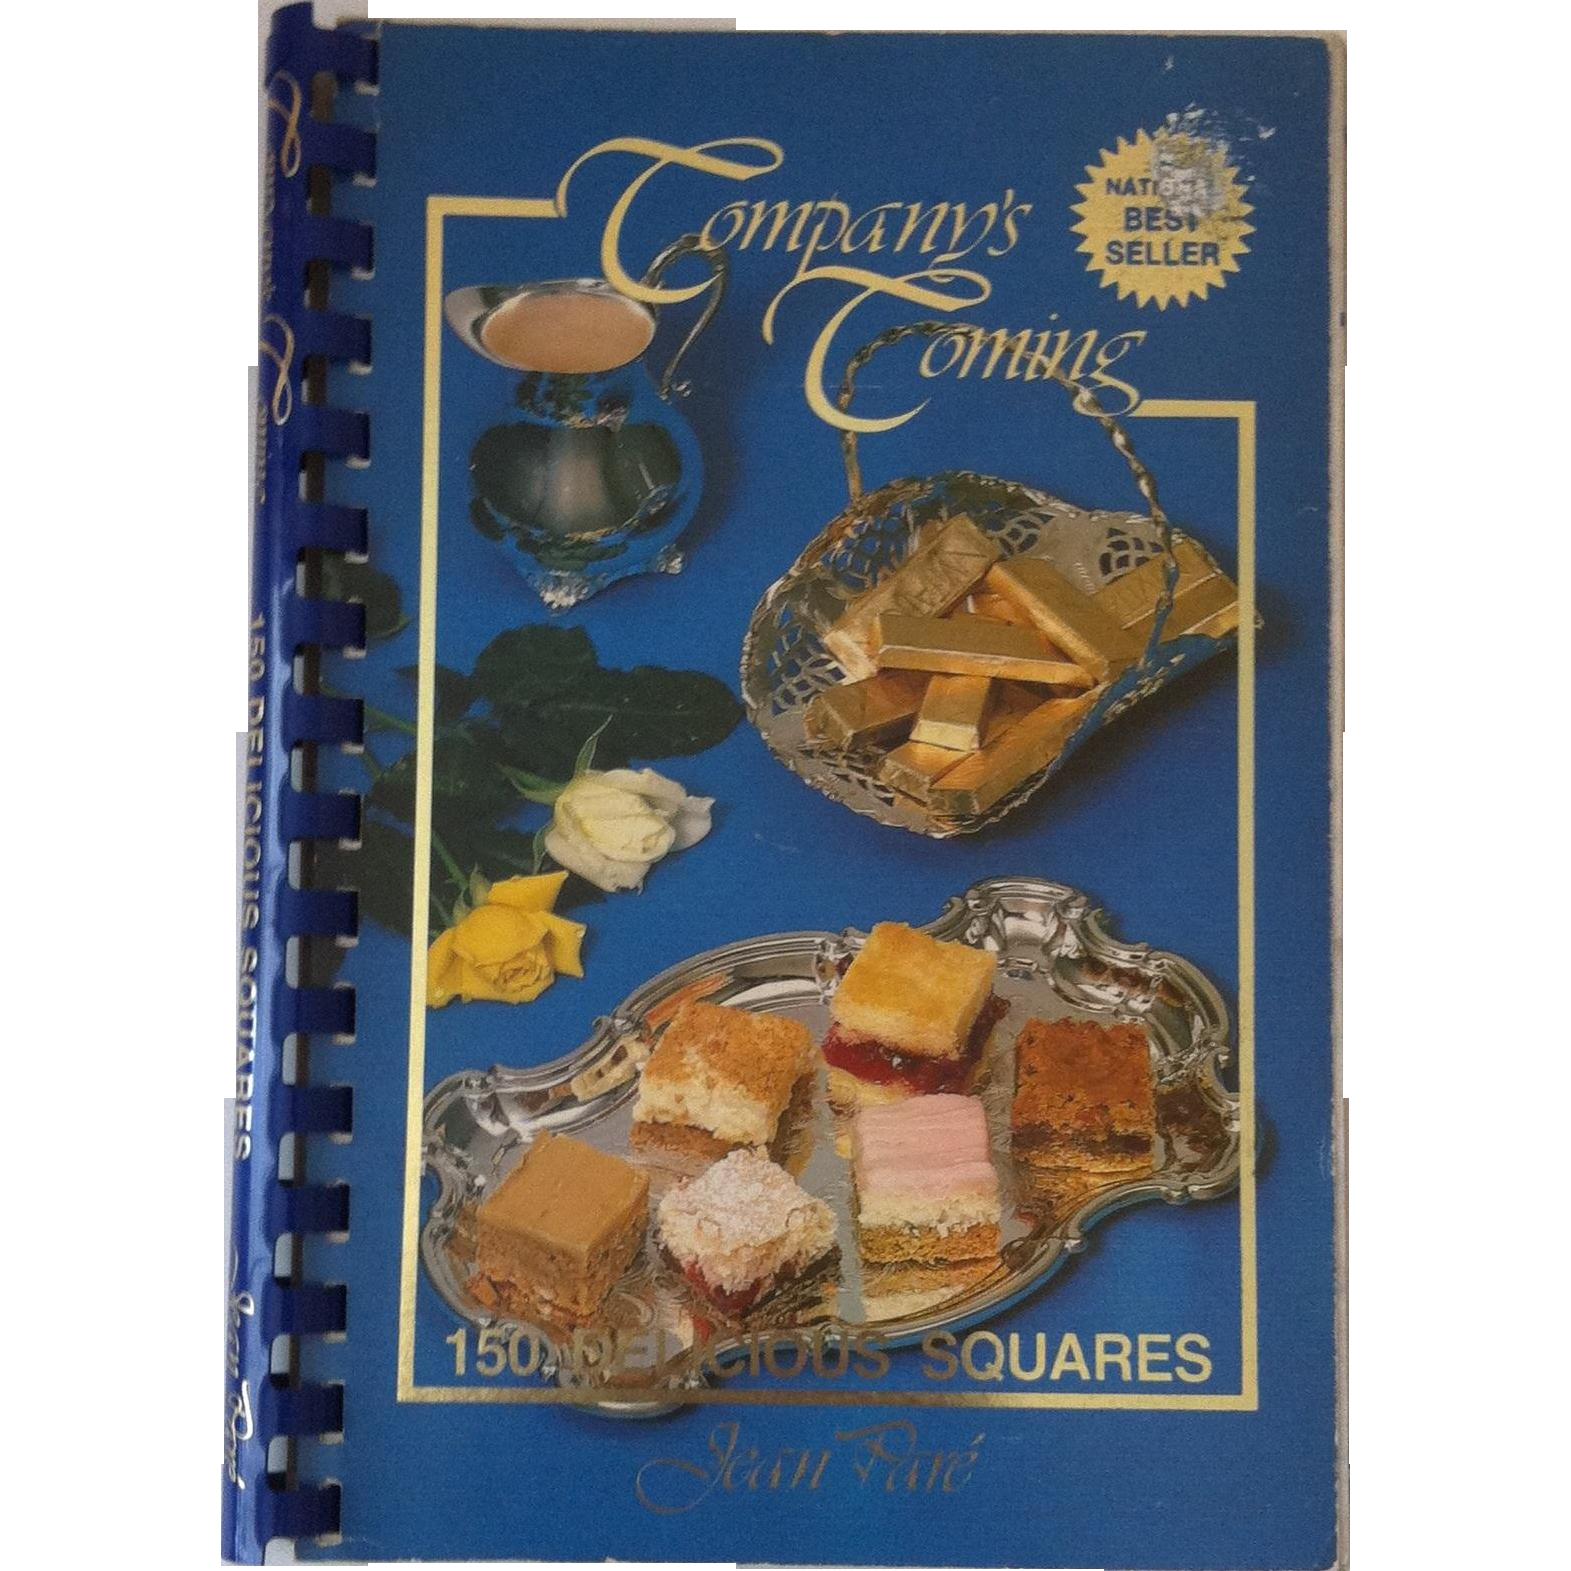 Company's Coming 150 Delicious Squares ~ Jean Pare'